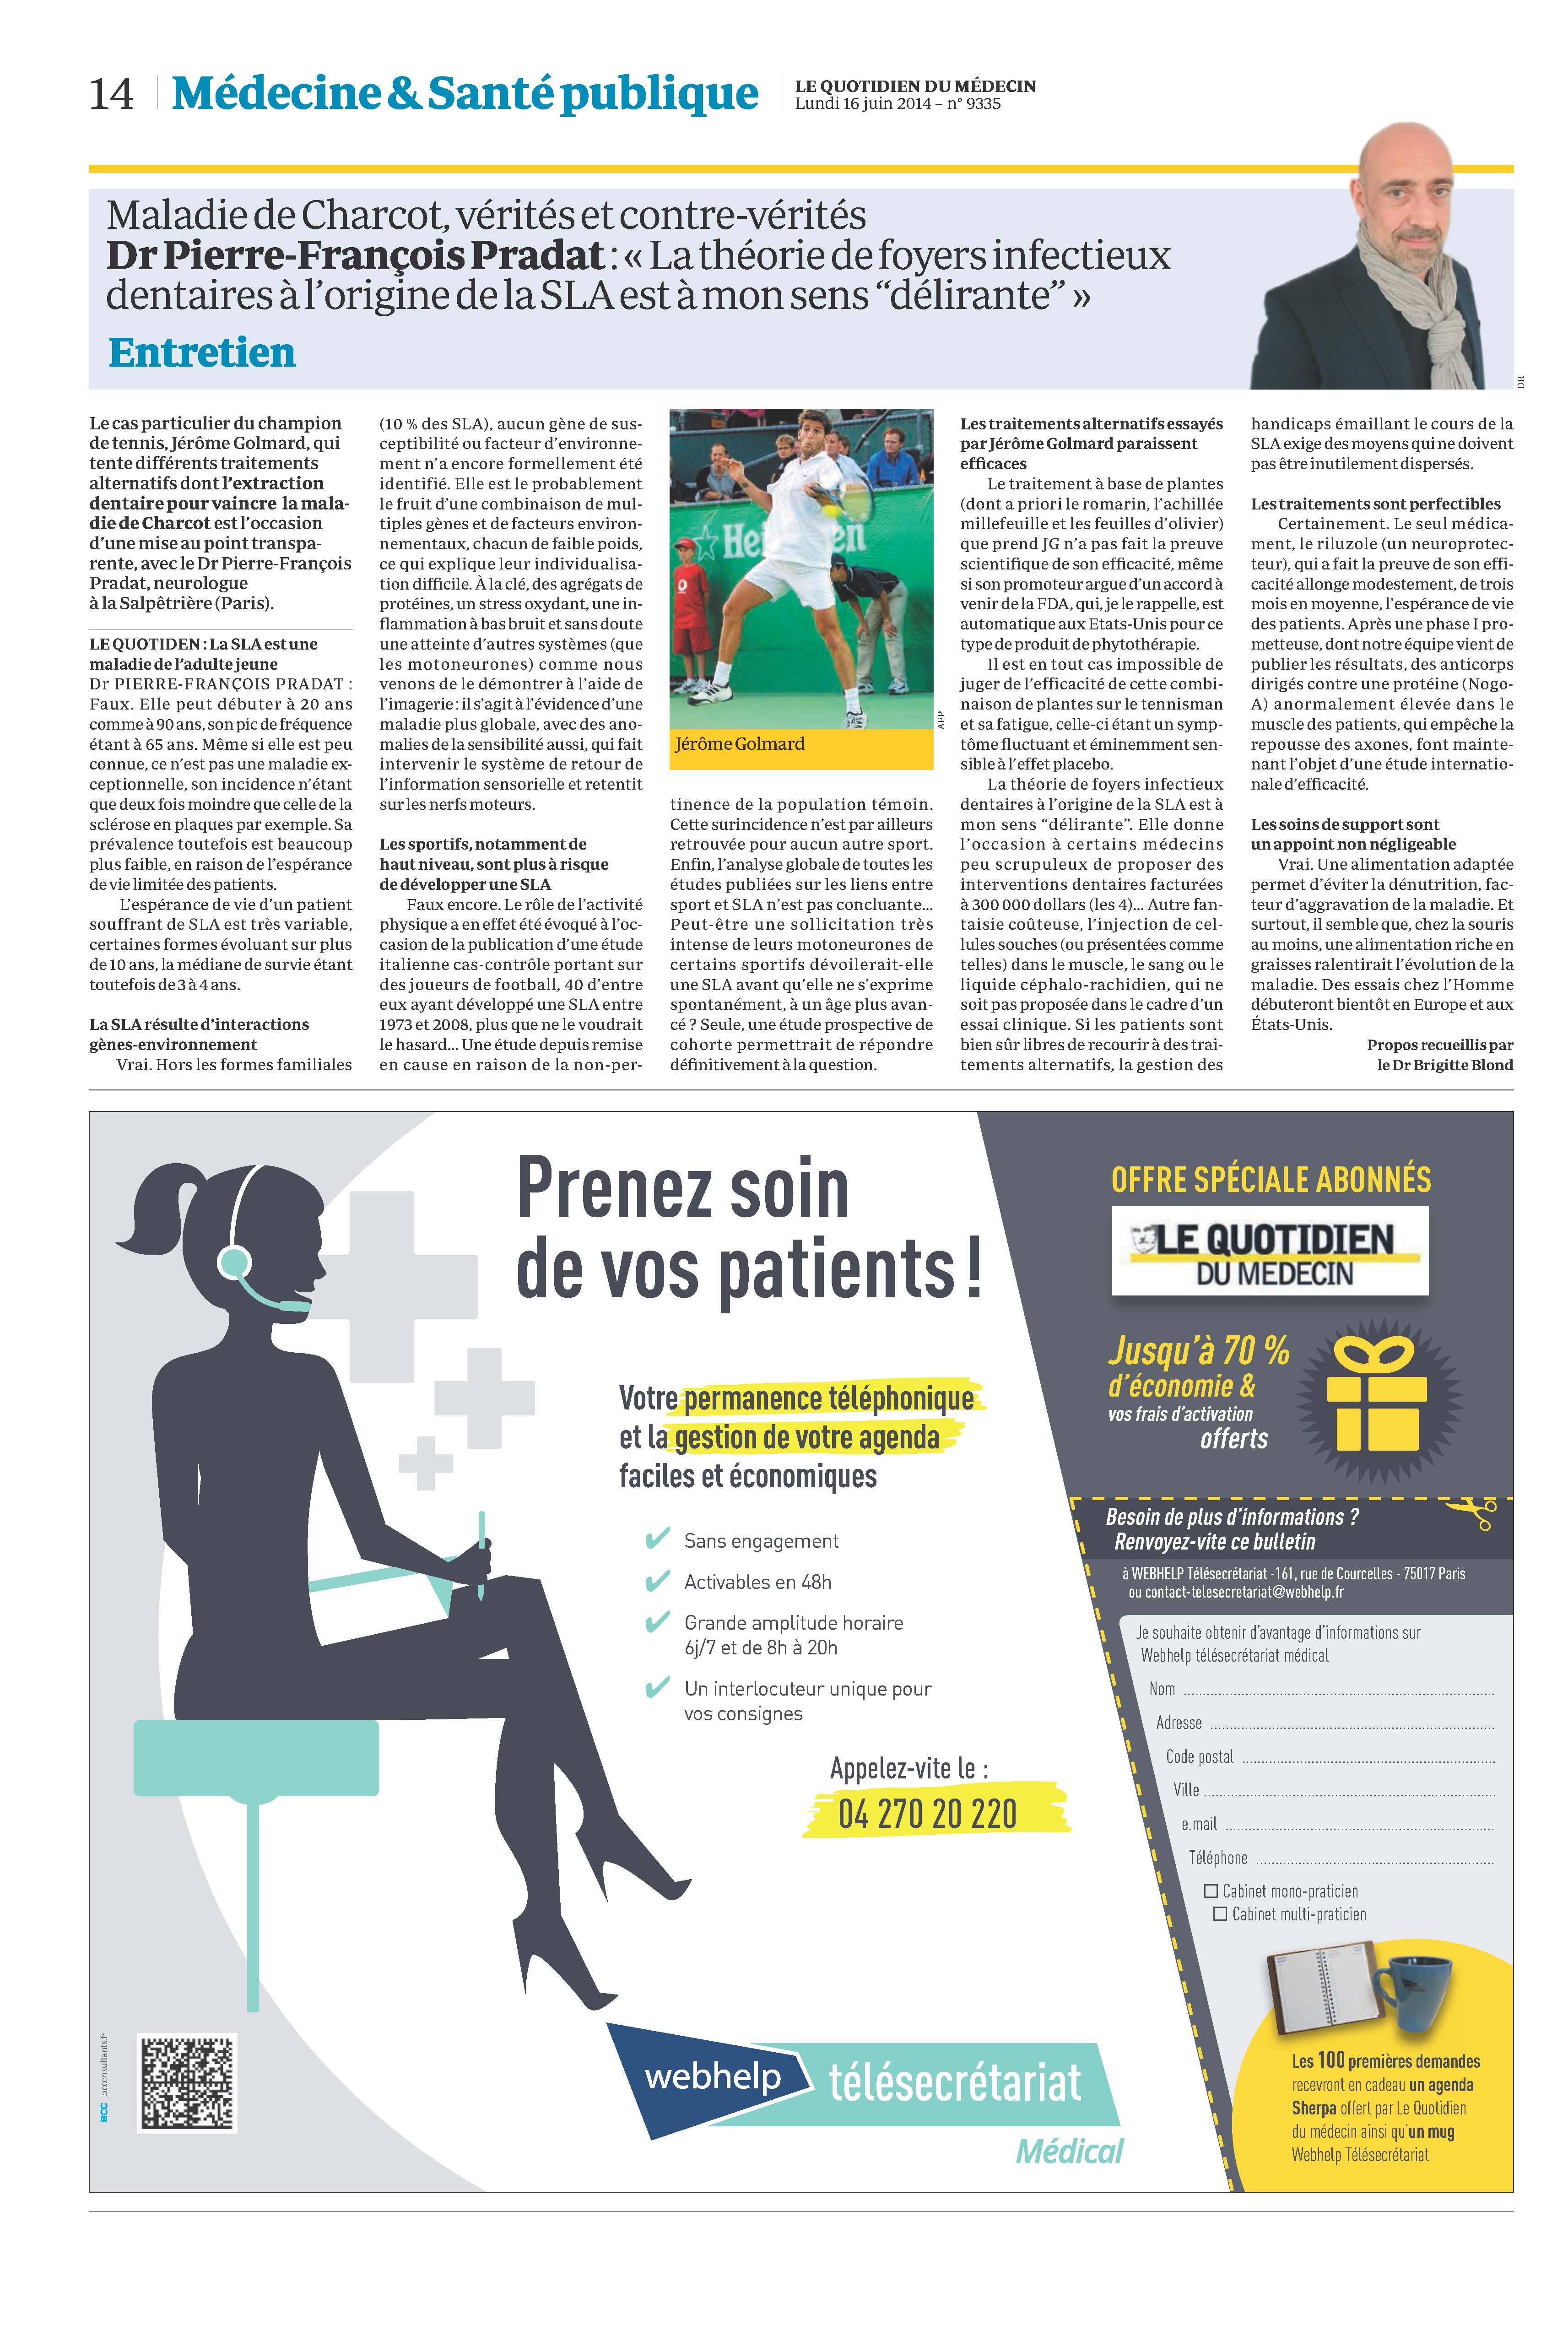 PradatQuot Medecin 2014 TennisV2